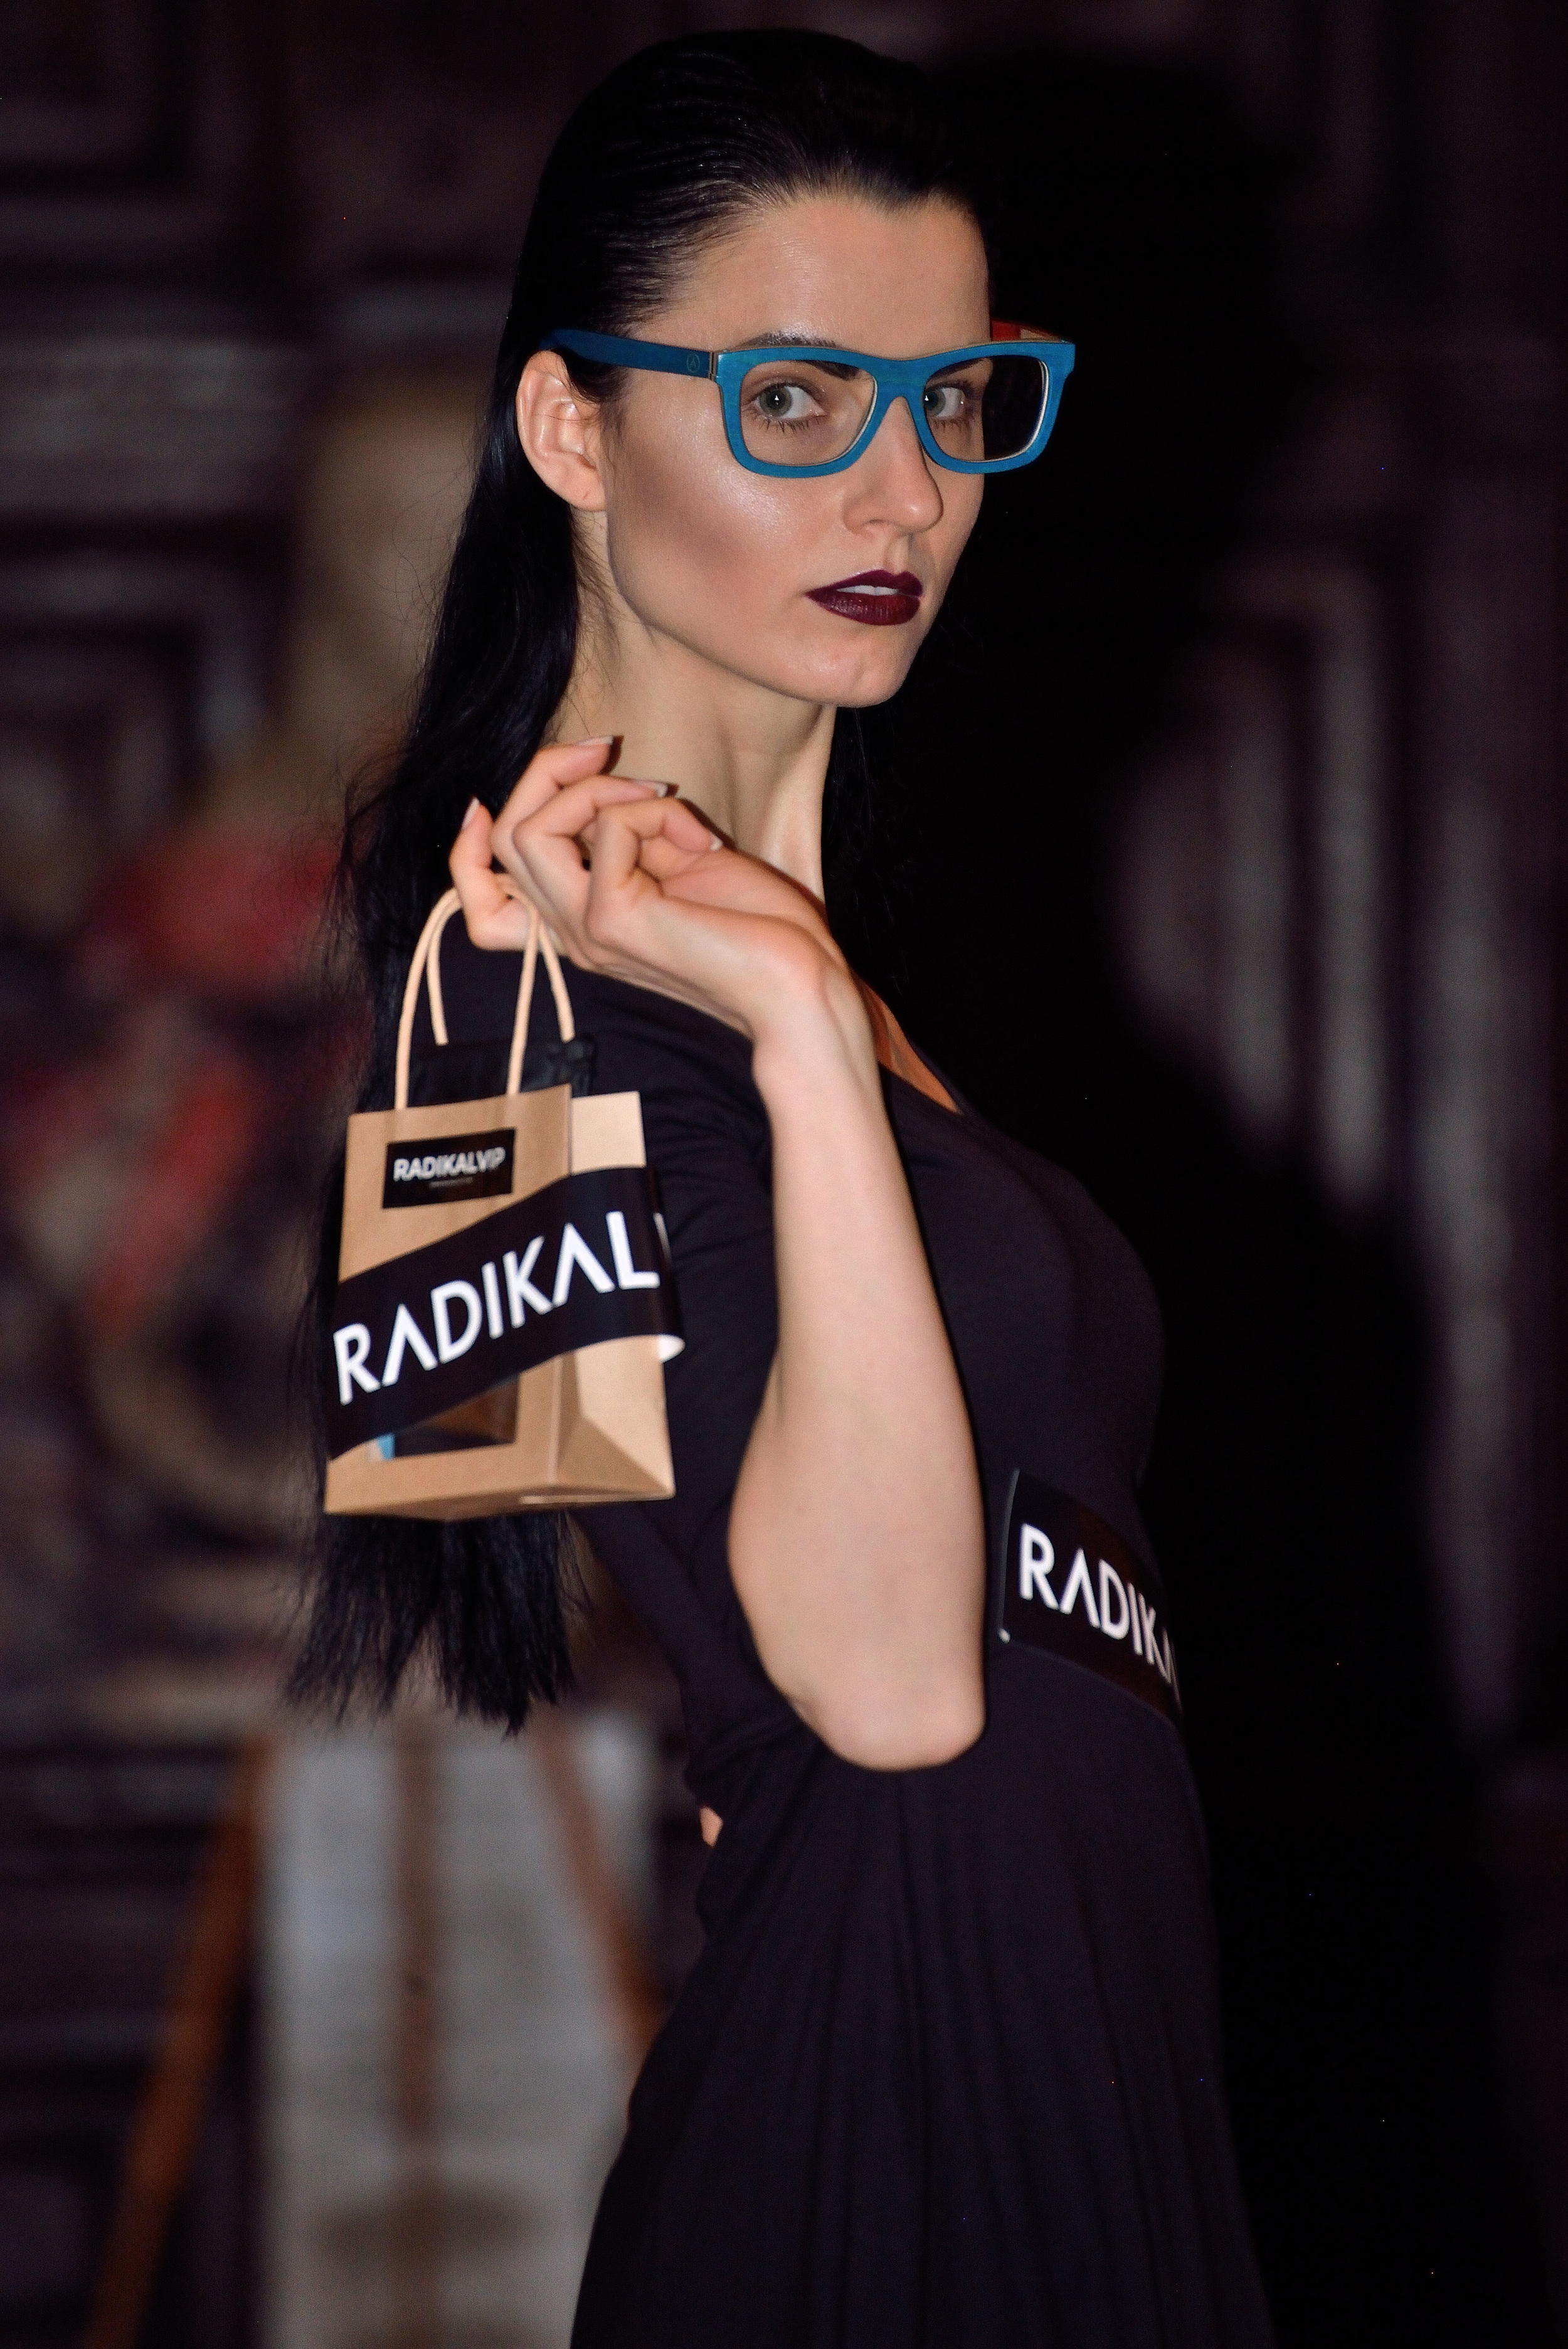 royal fashio day london fashion week7 copy.JPG